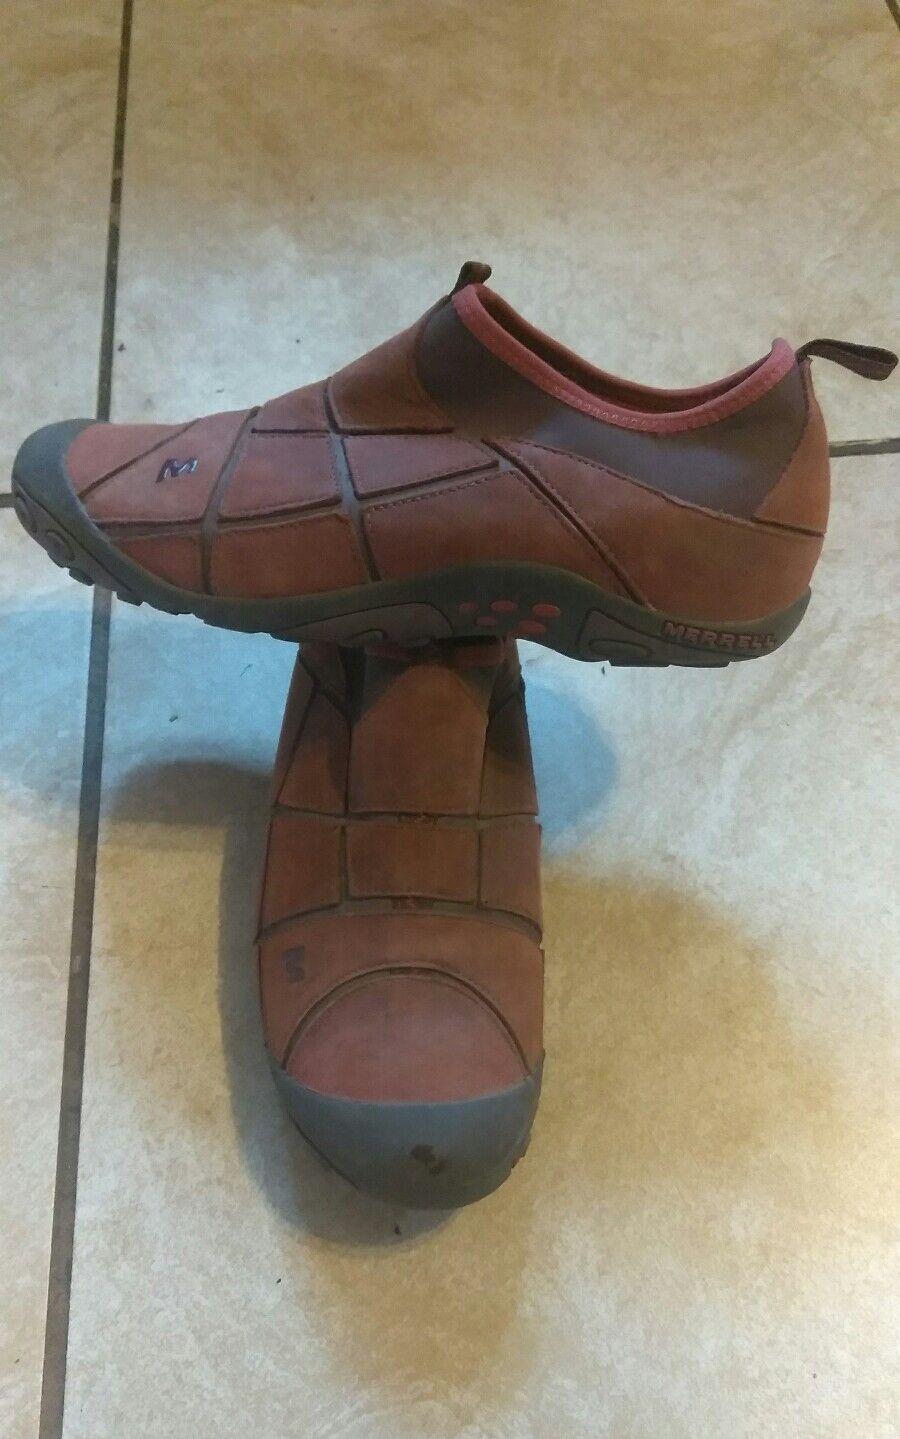 Merrell Mosiac quemado Heena Mujer Zapatos Zapatos Zapatos 8.5  oferta especial